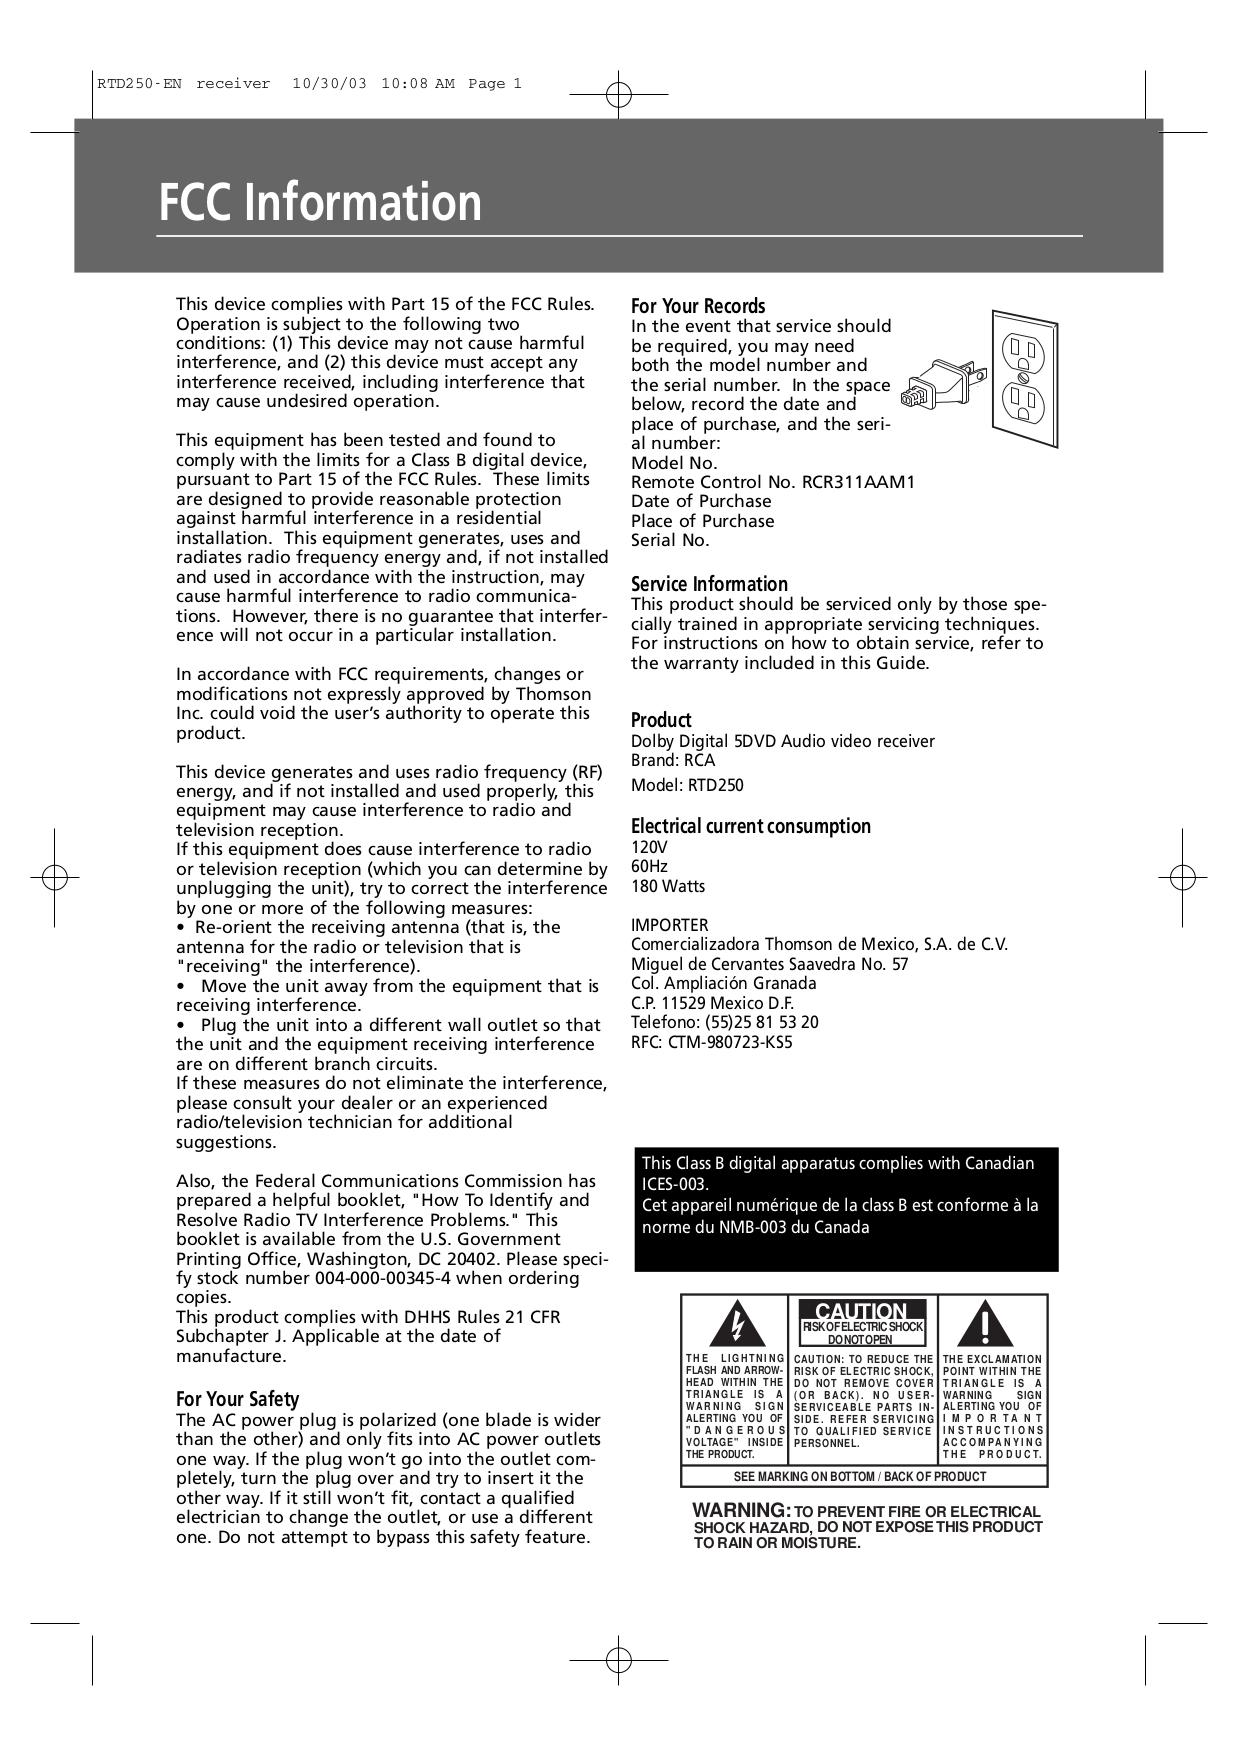 Fancy Electrician Manual Pdf Crest - Wiring Standart Installations ...